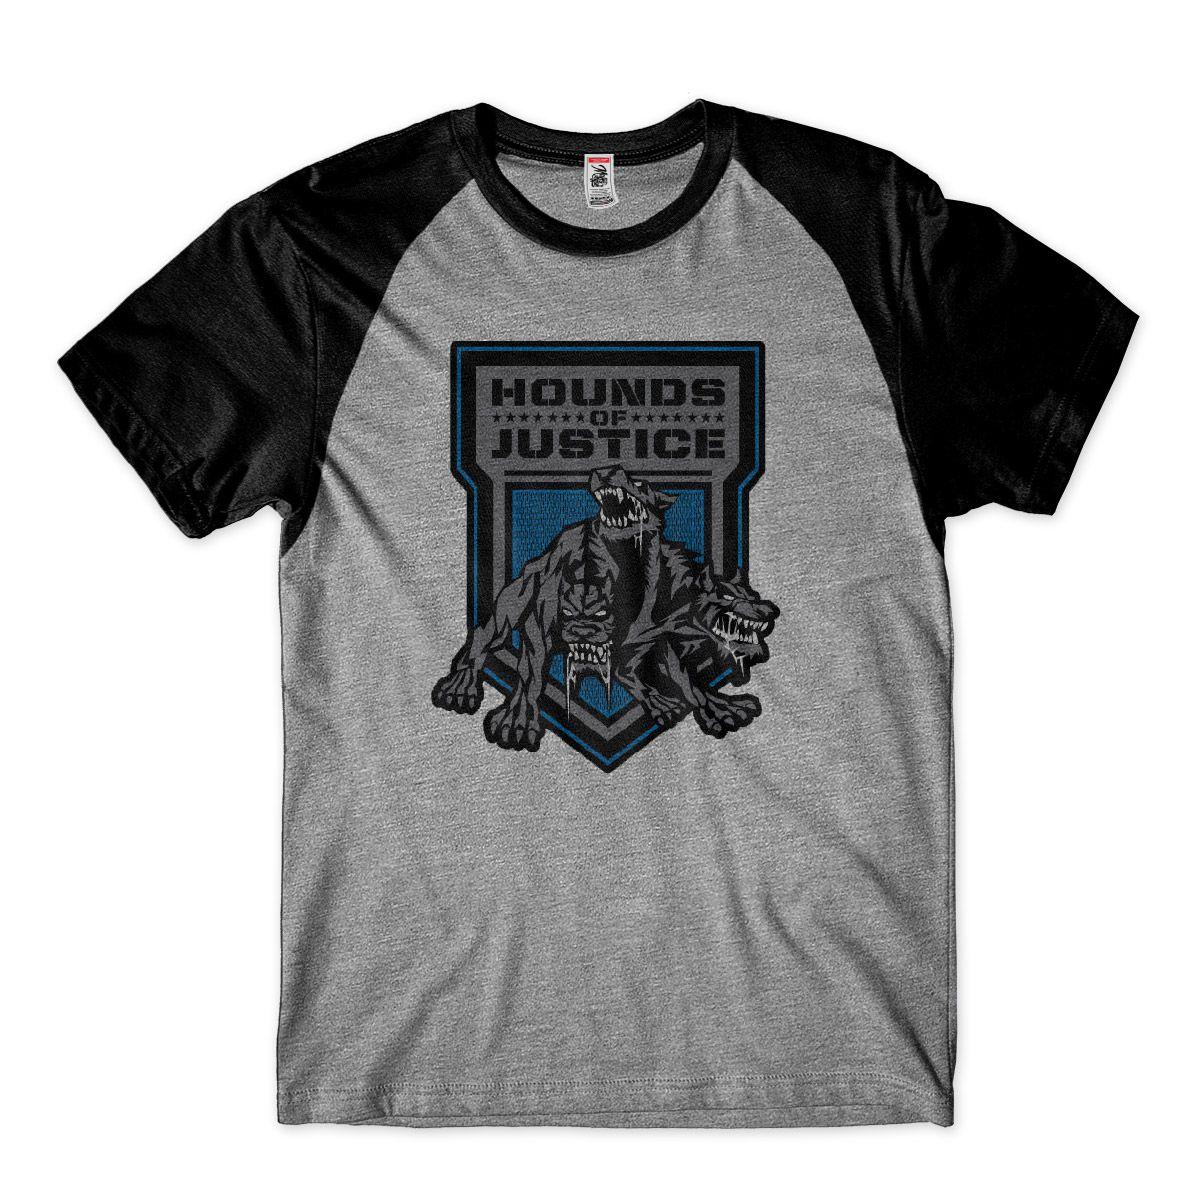 Camiseta Wwe Hound Of Justice Roman Reigns Wrestling